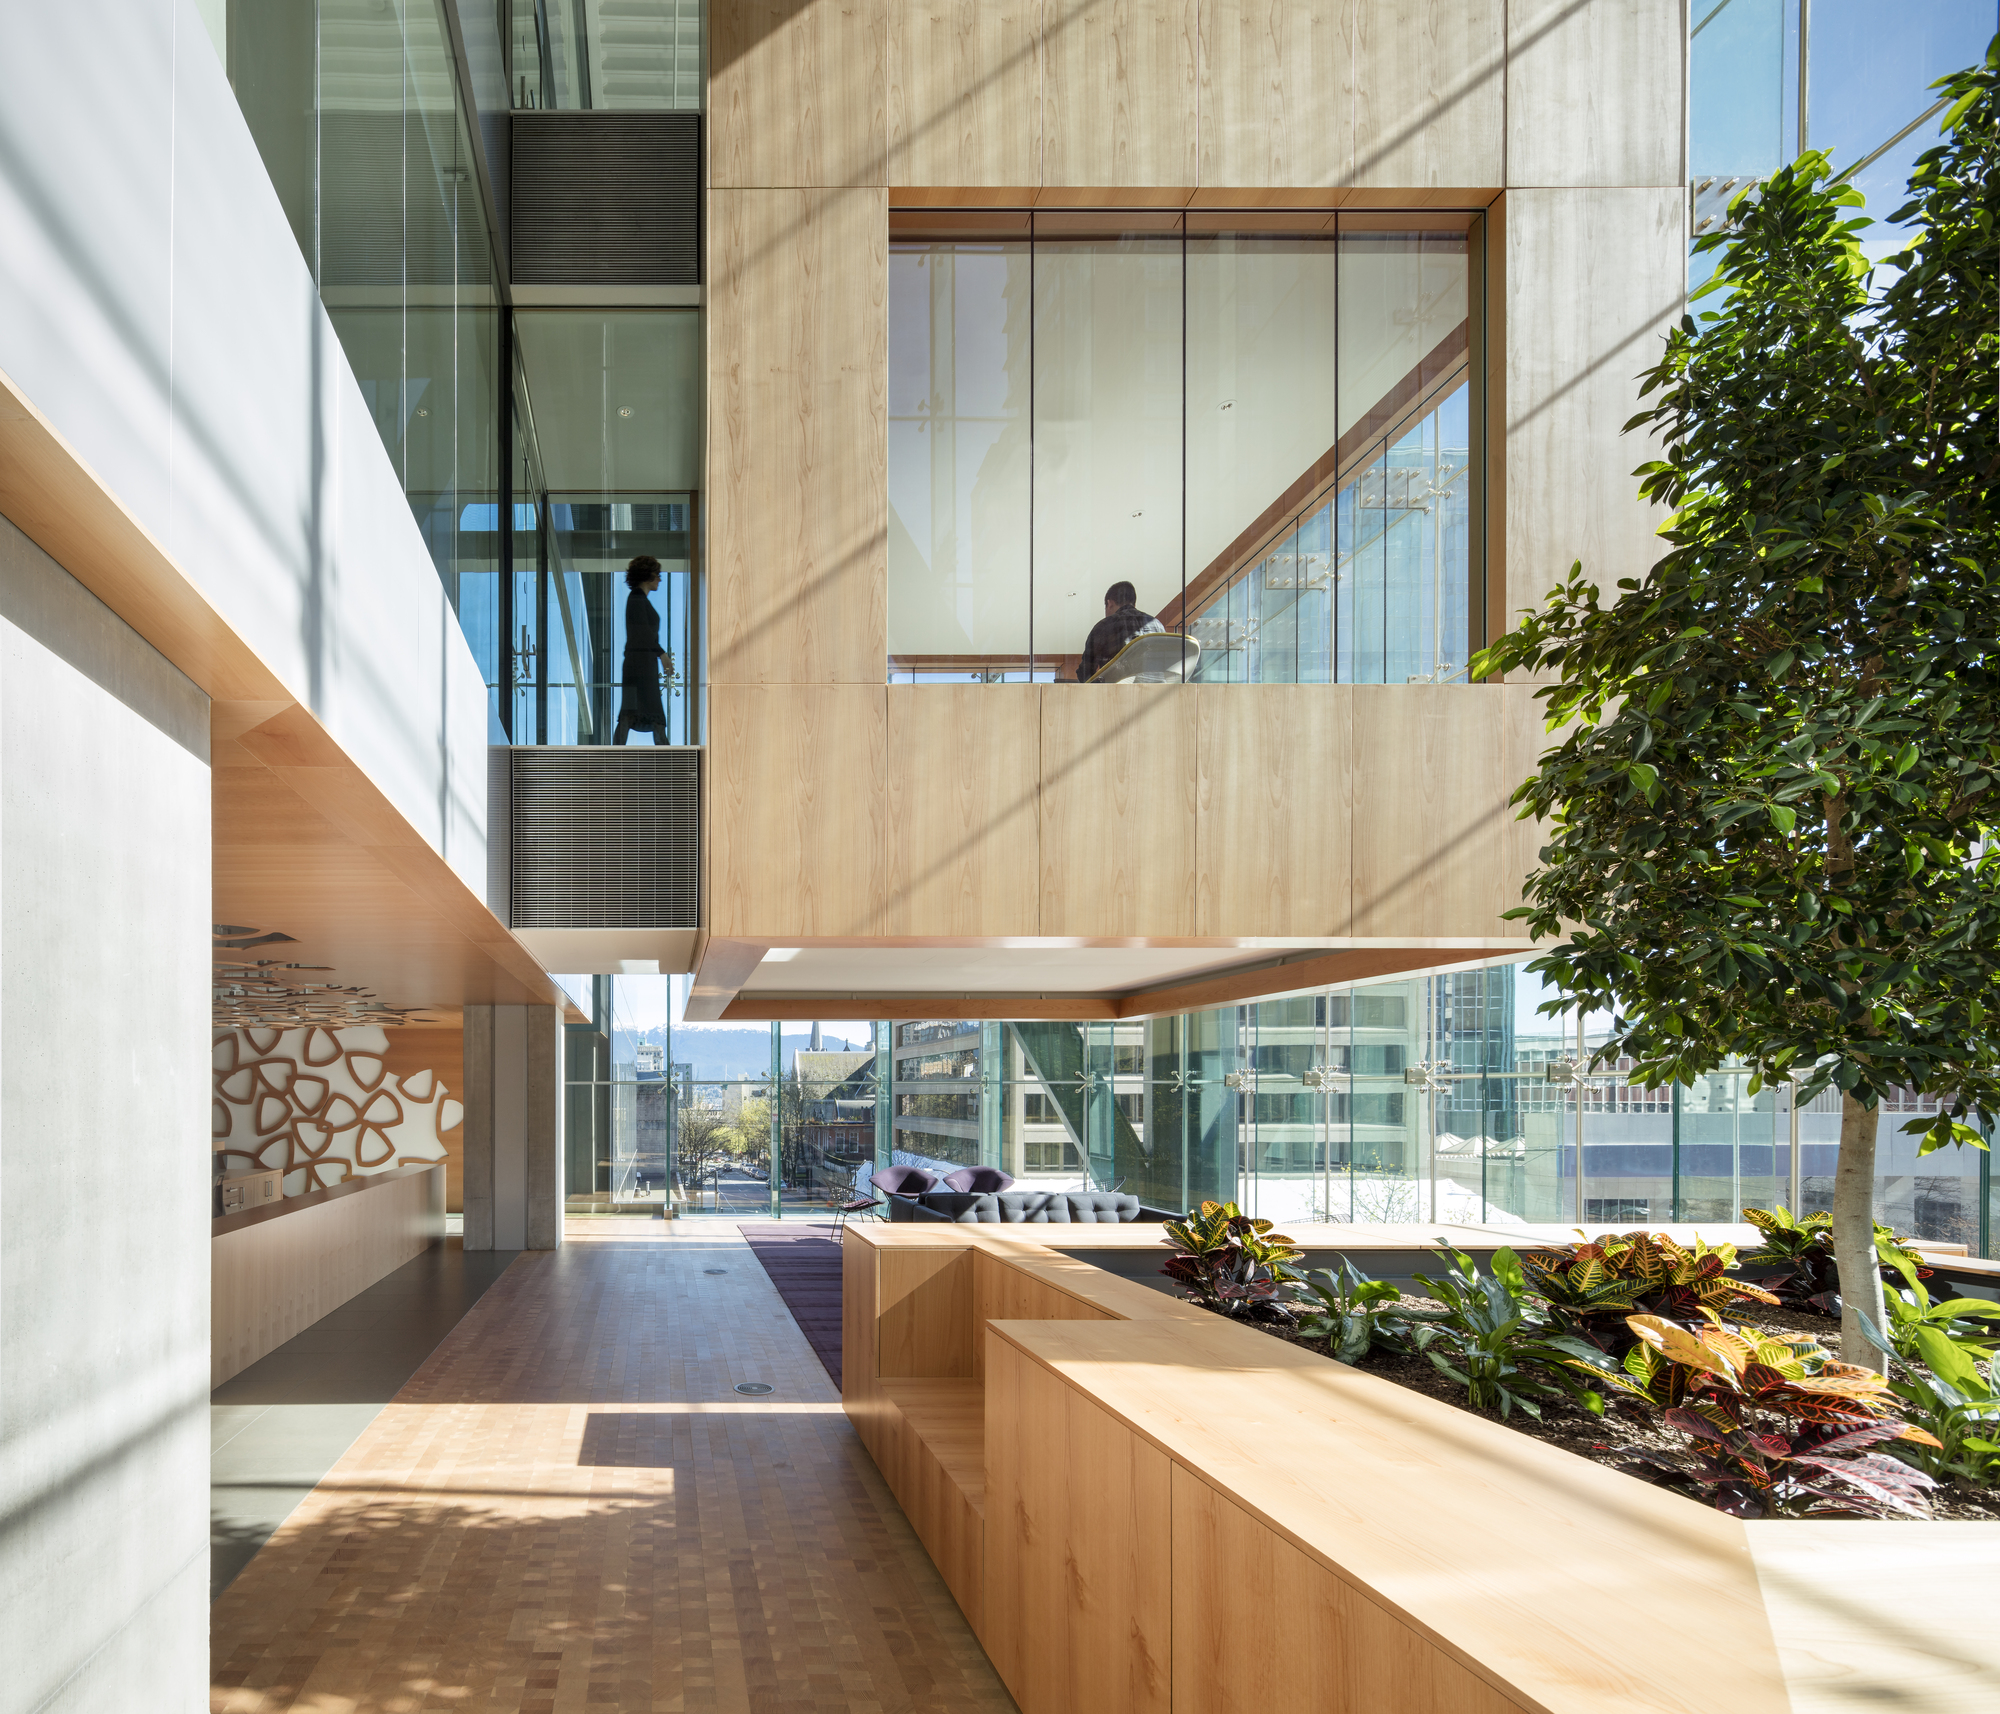 Telus Garden Office Of Mcfarlane Biggar Architects